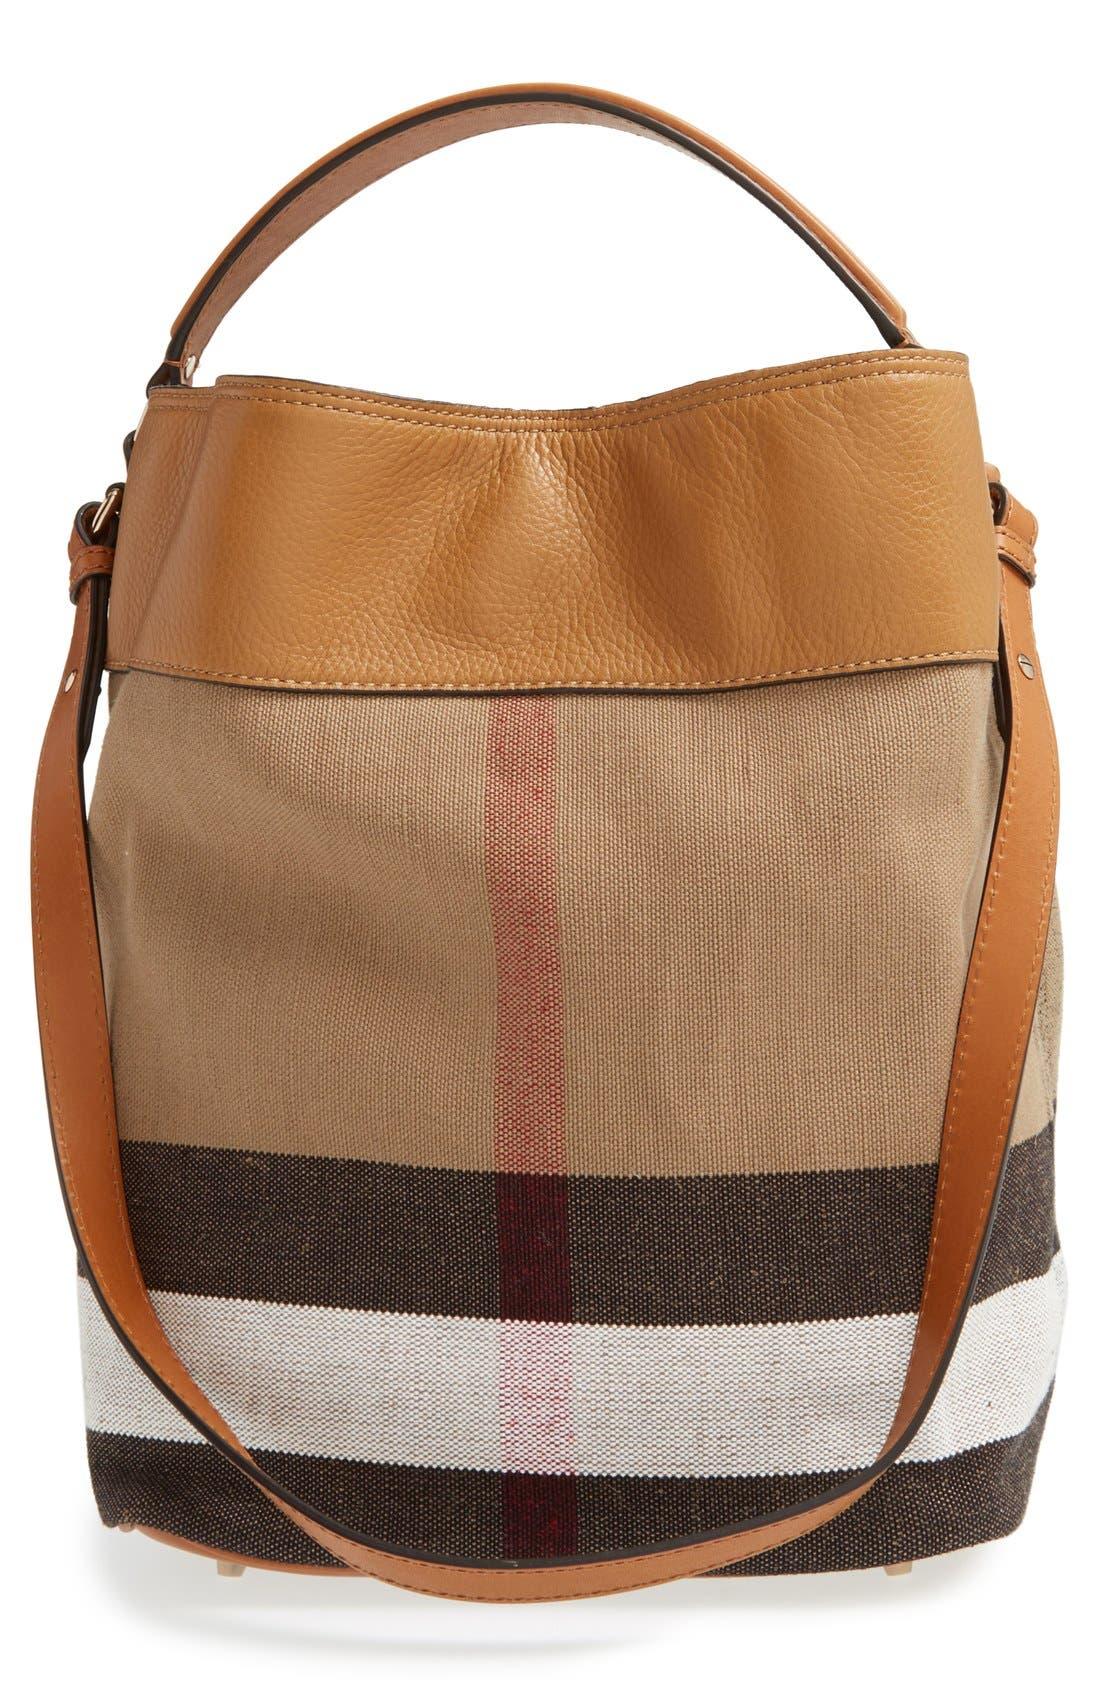 BURBERRY,                             Medium Ashby Bucket Bag,                             Alternate thumbnail 3, color,                             200